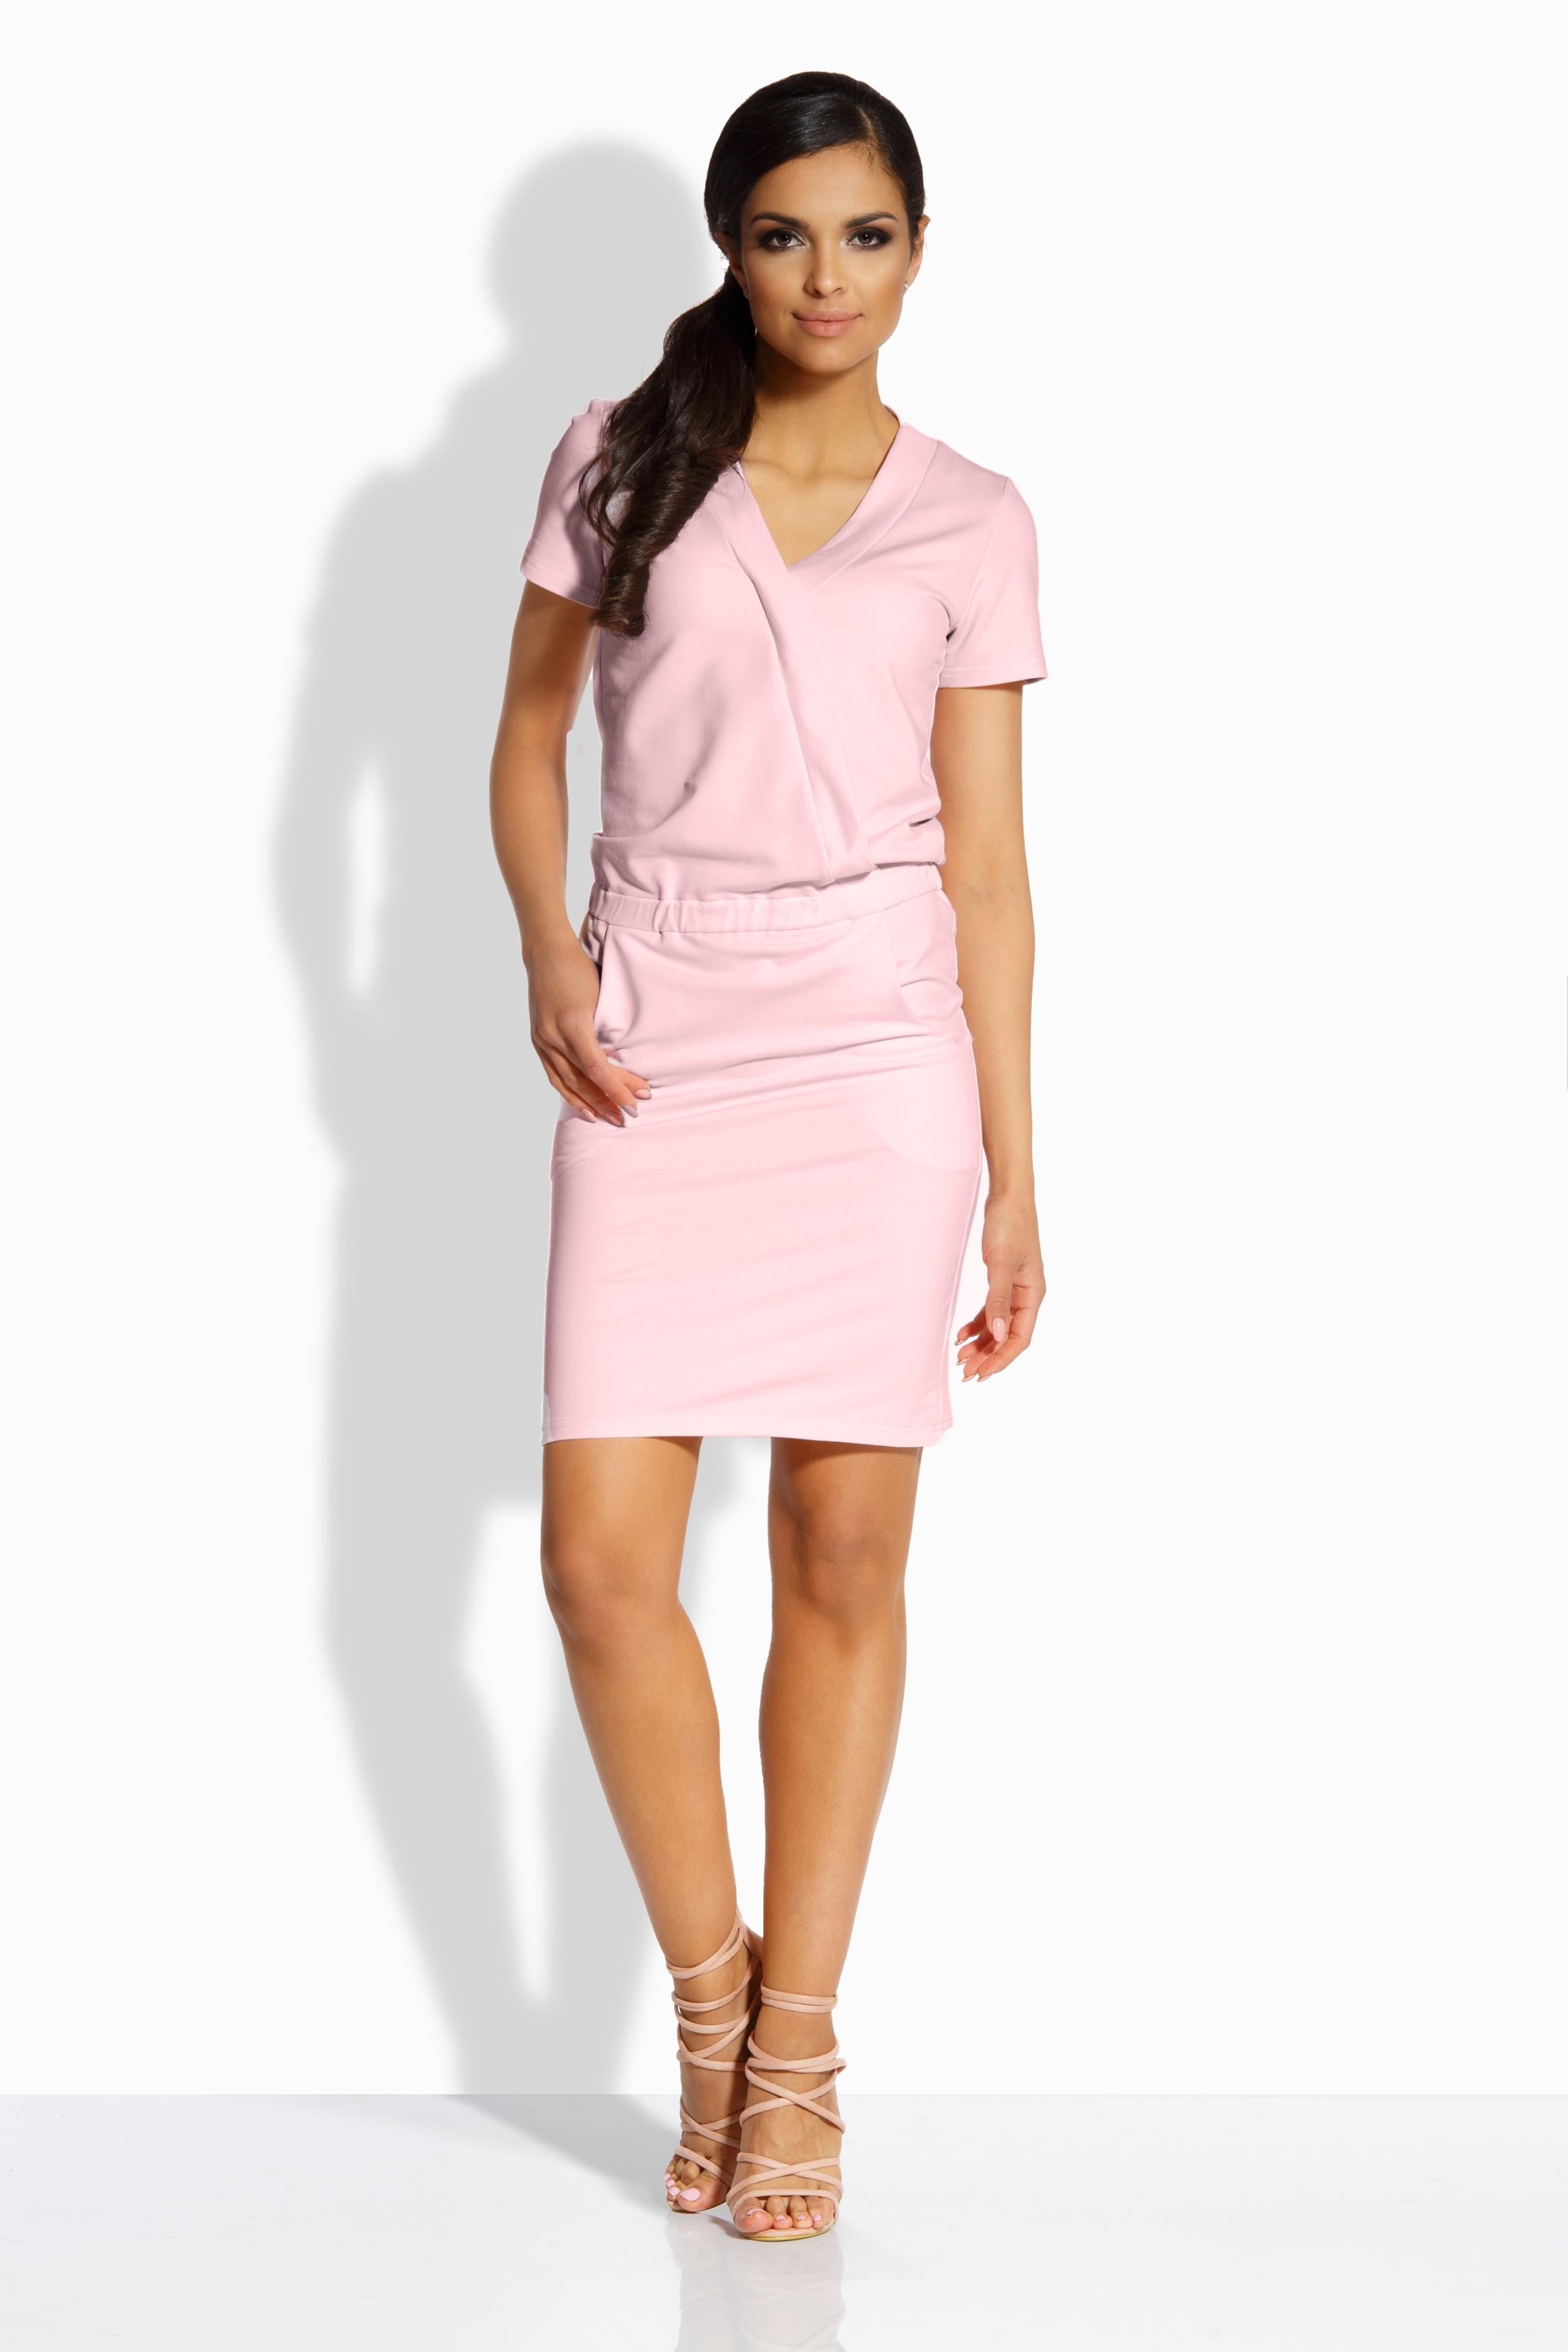 Dámské šaty LEMONIADE L196 růžové